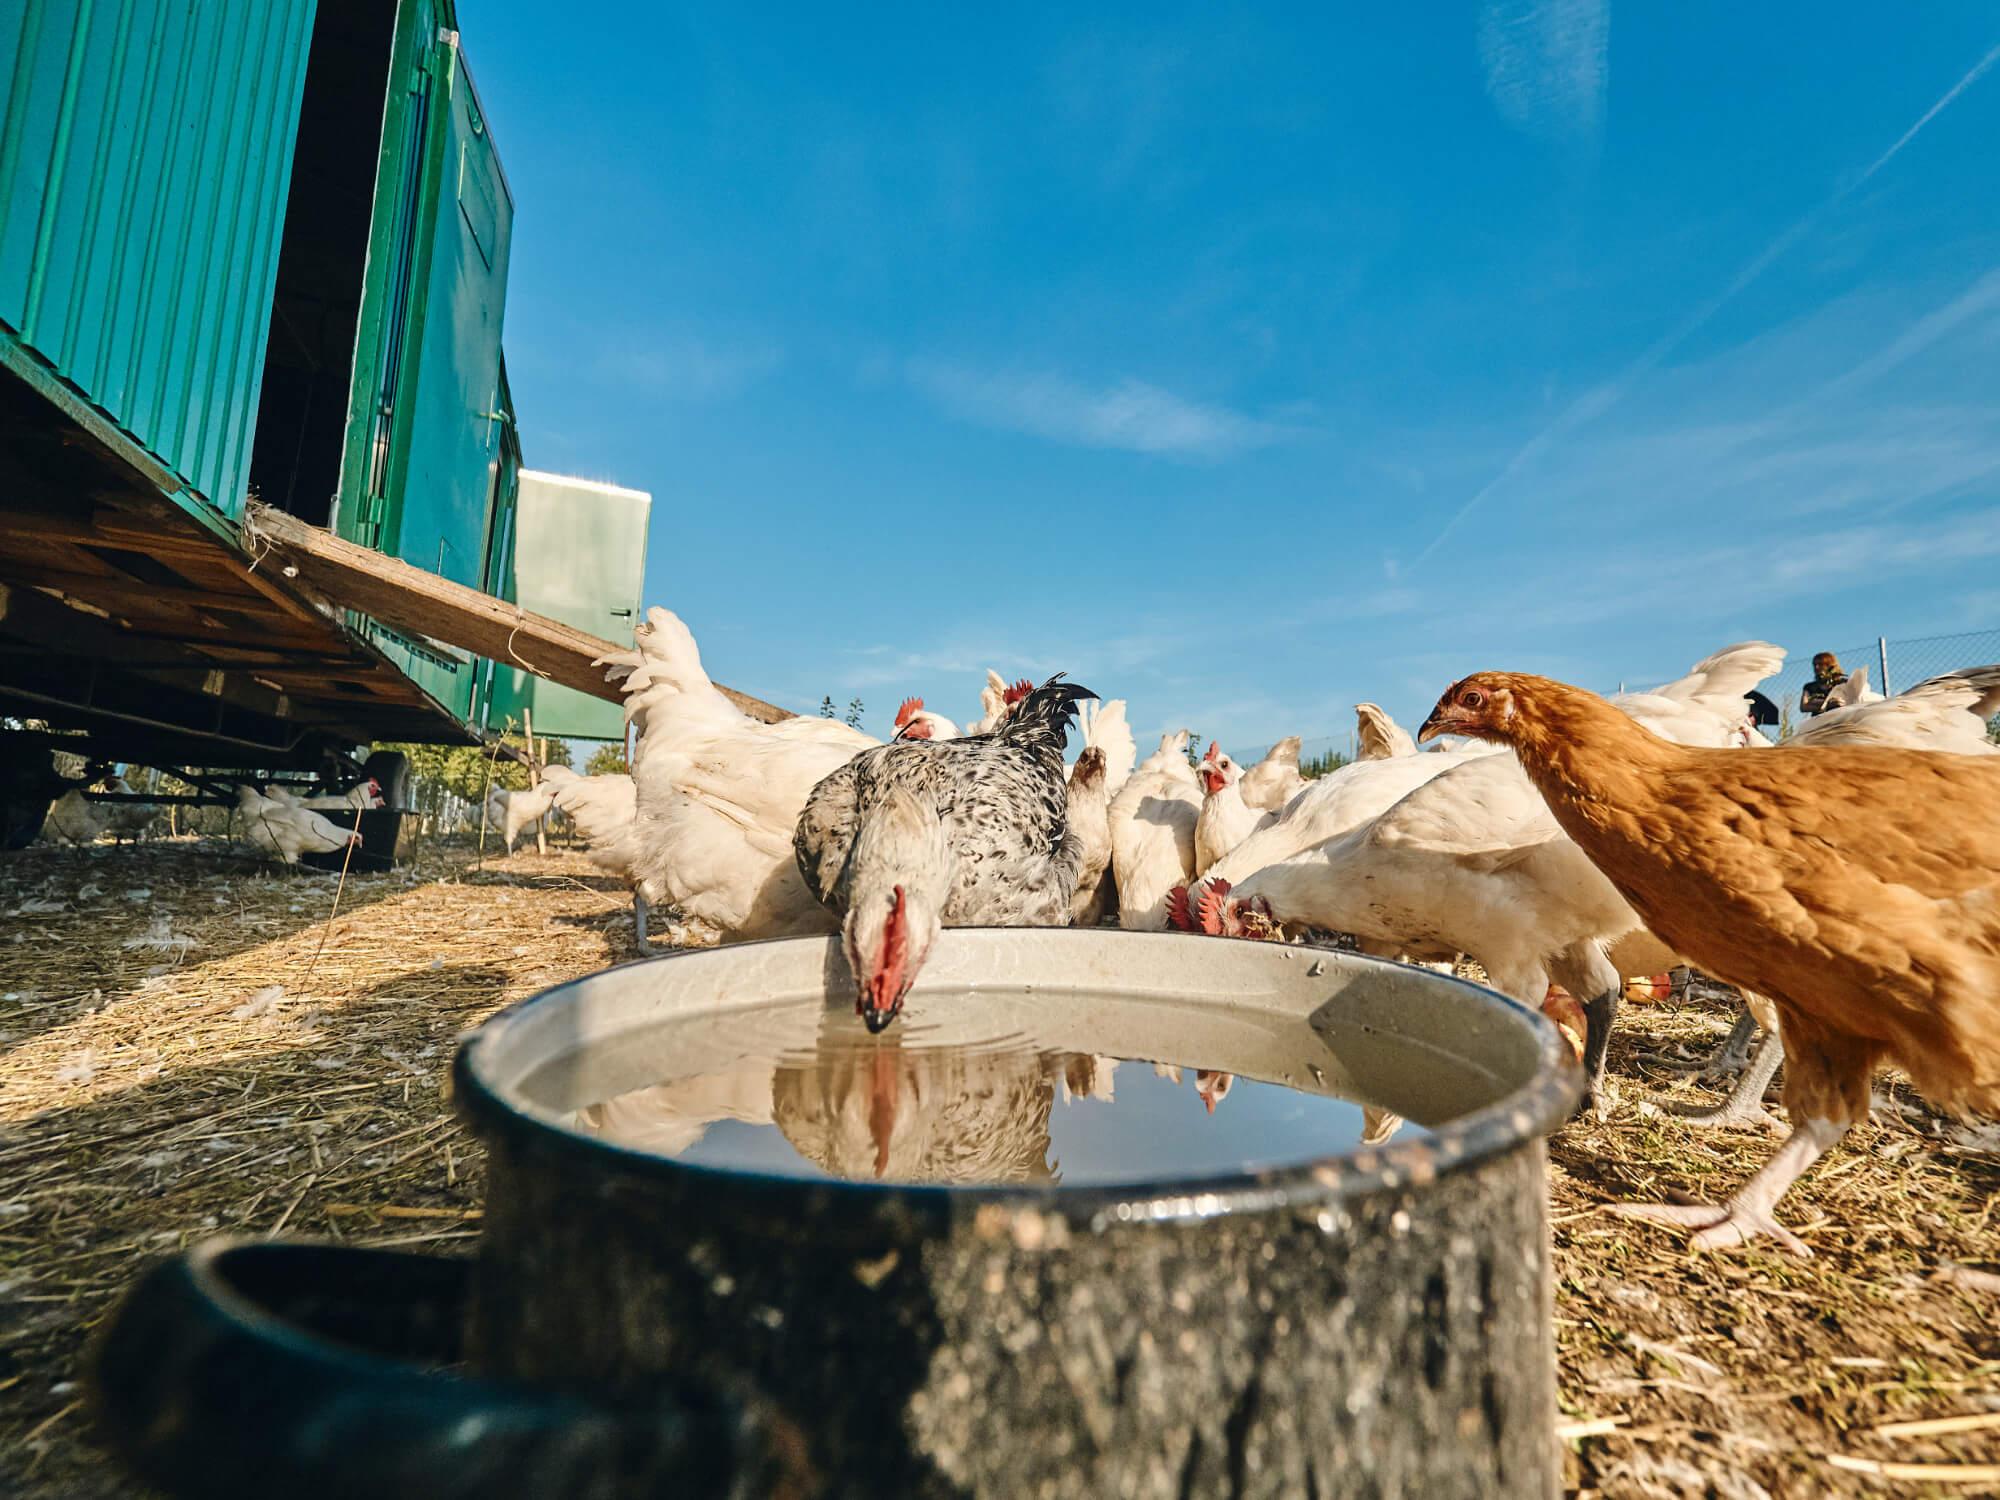 Les Bleues – Bio-Hühner-Haltung in Götteldorf